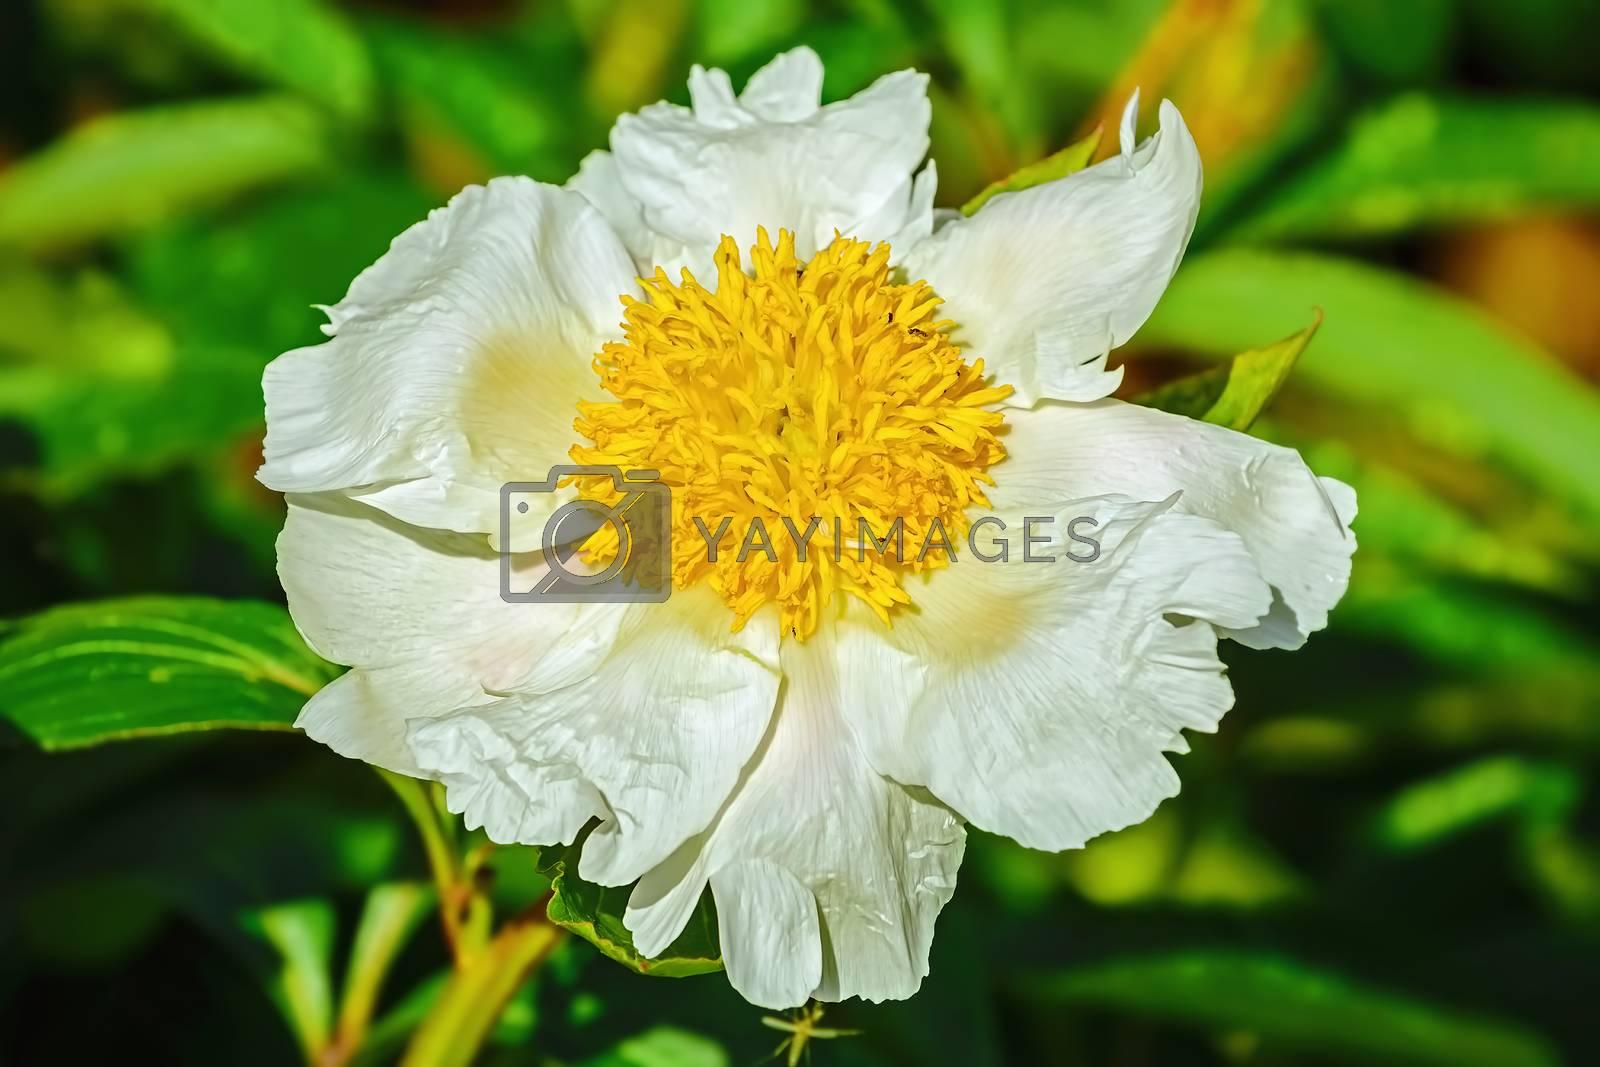 Flower of Peony in the garden